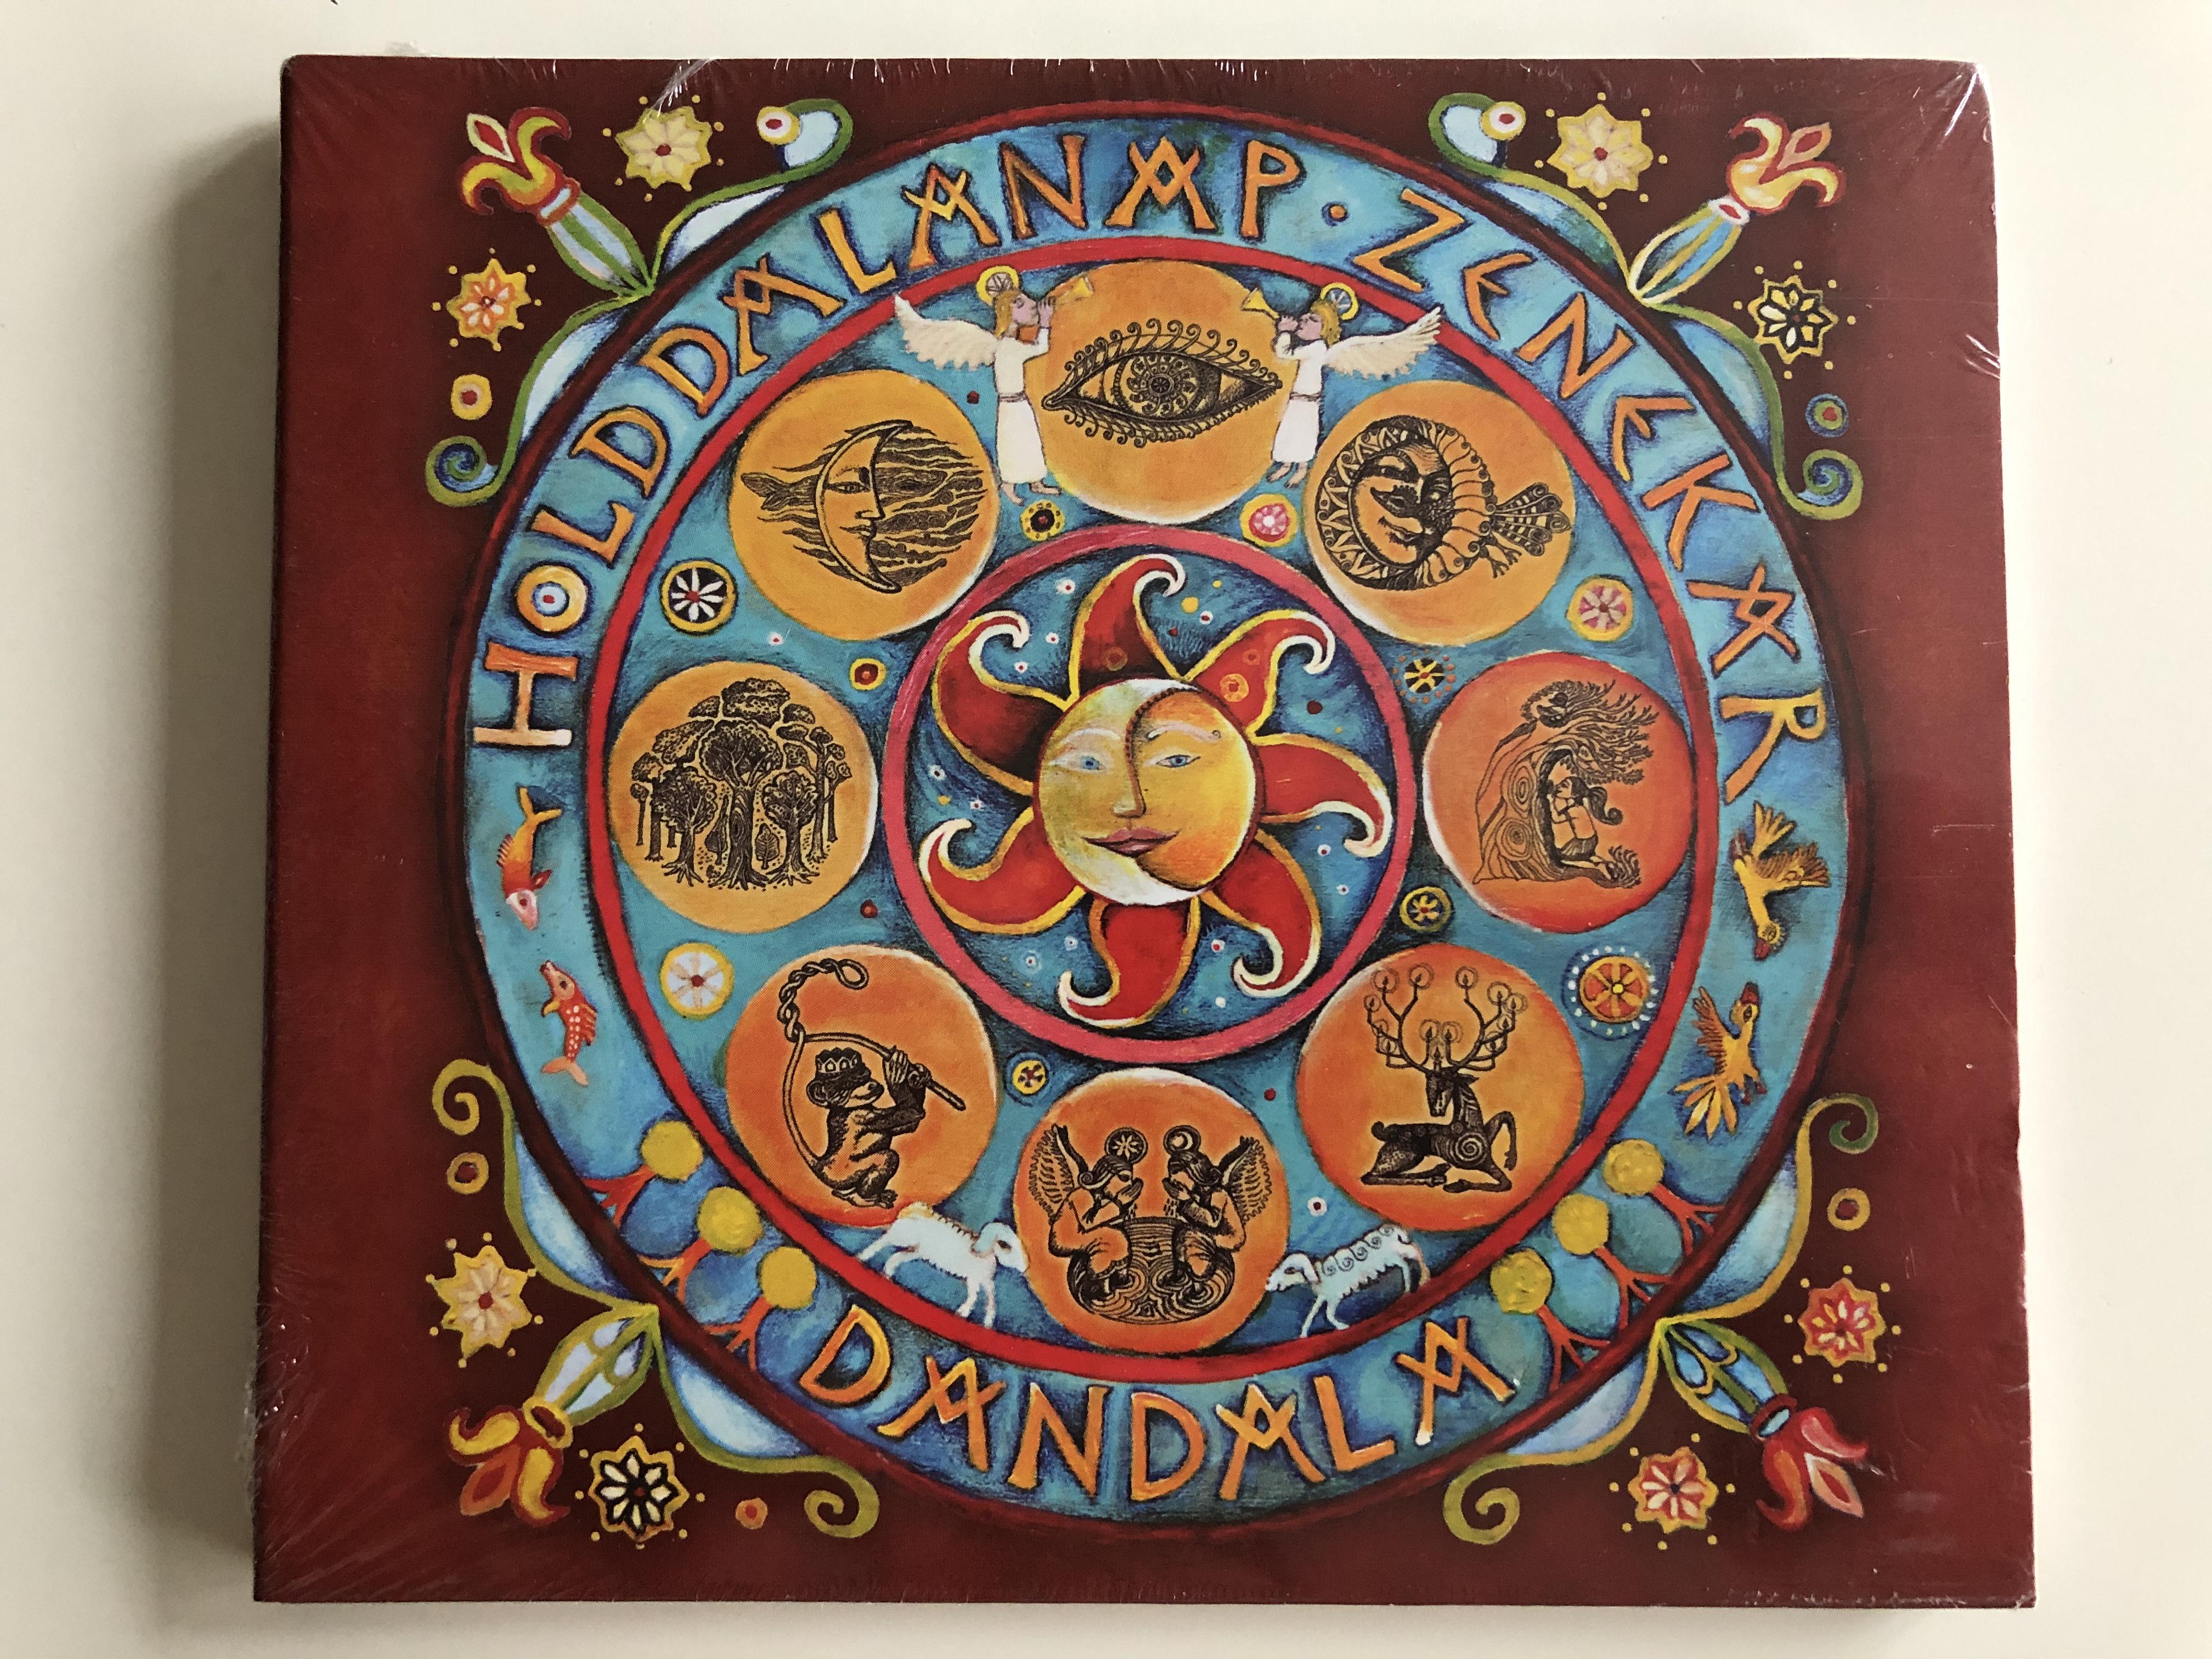 holddalanap-zenekar-dandala-gryllus-audio-cd-2014-gcd-137-1-.jpg